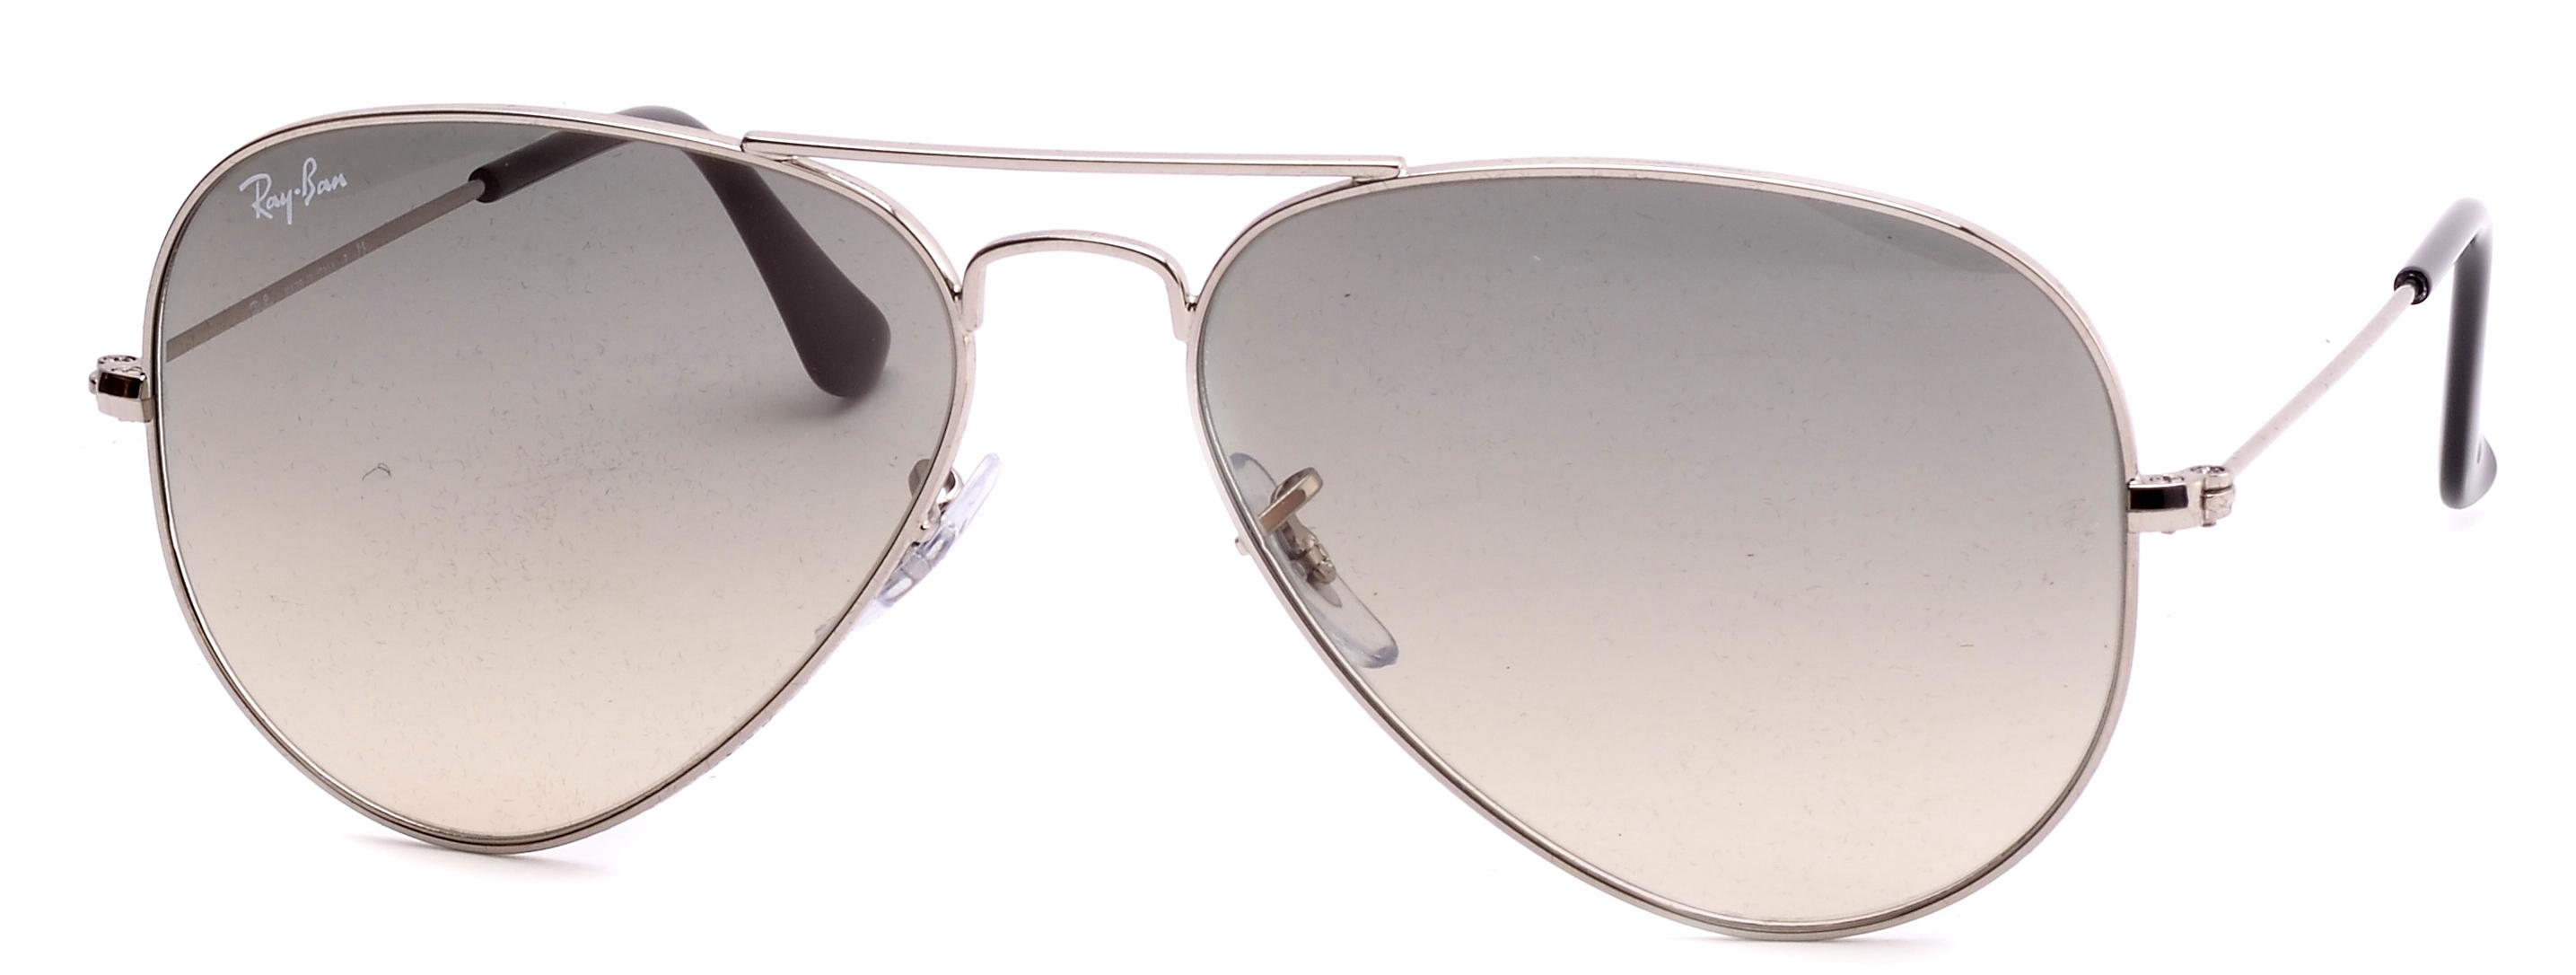 ray ban sunglasses sale uk  ray ban women\'s sunglasses